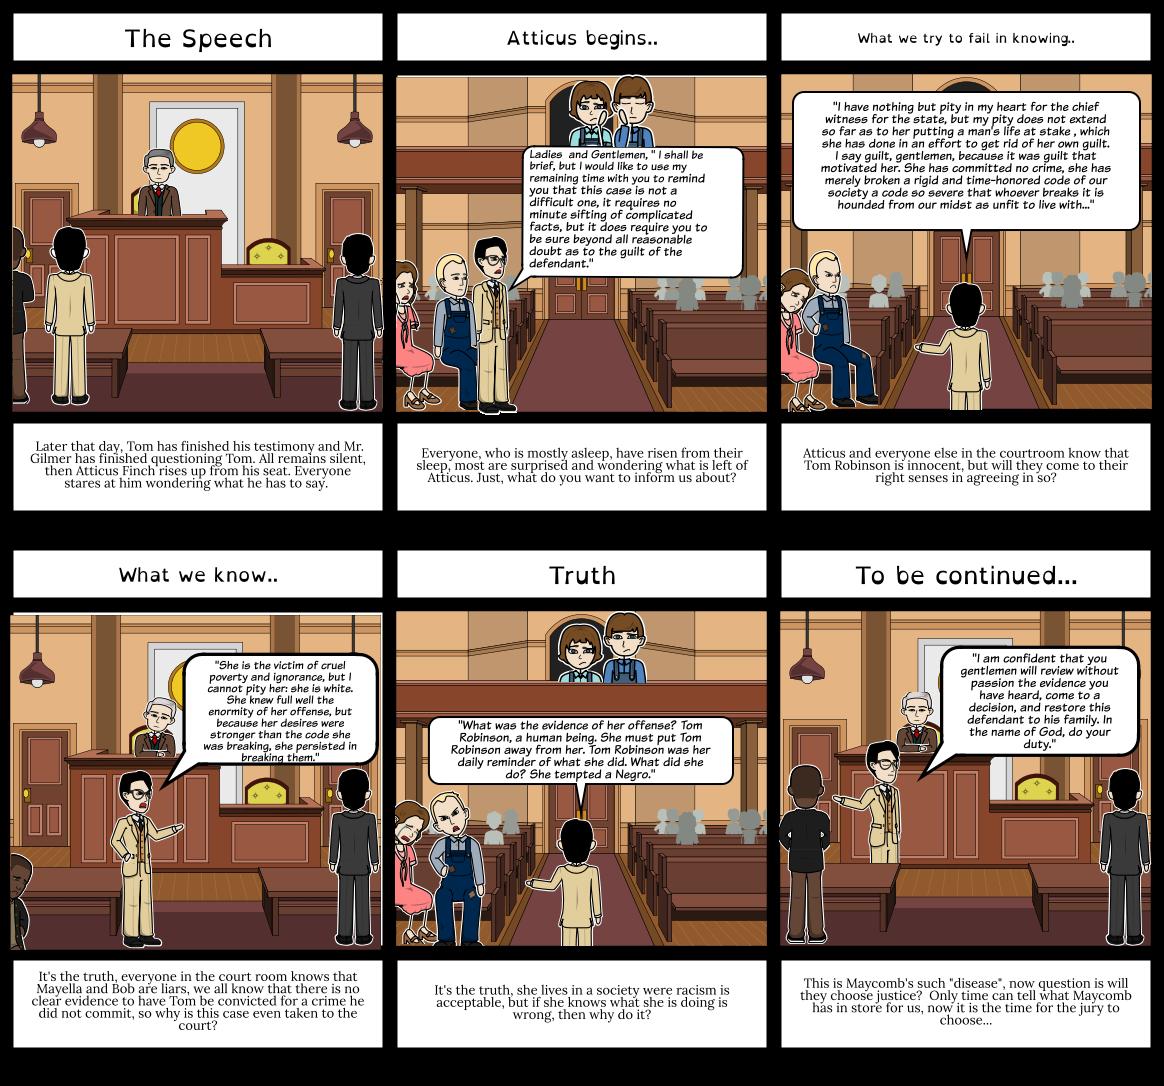 TKAM, Chapter 20: Atticus's speech